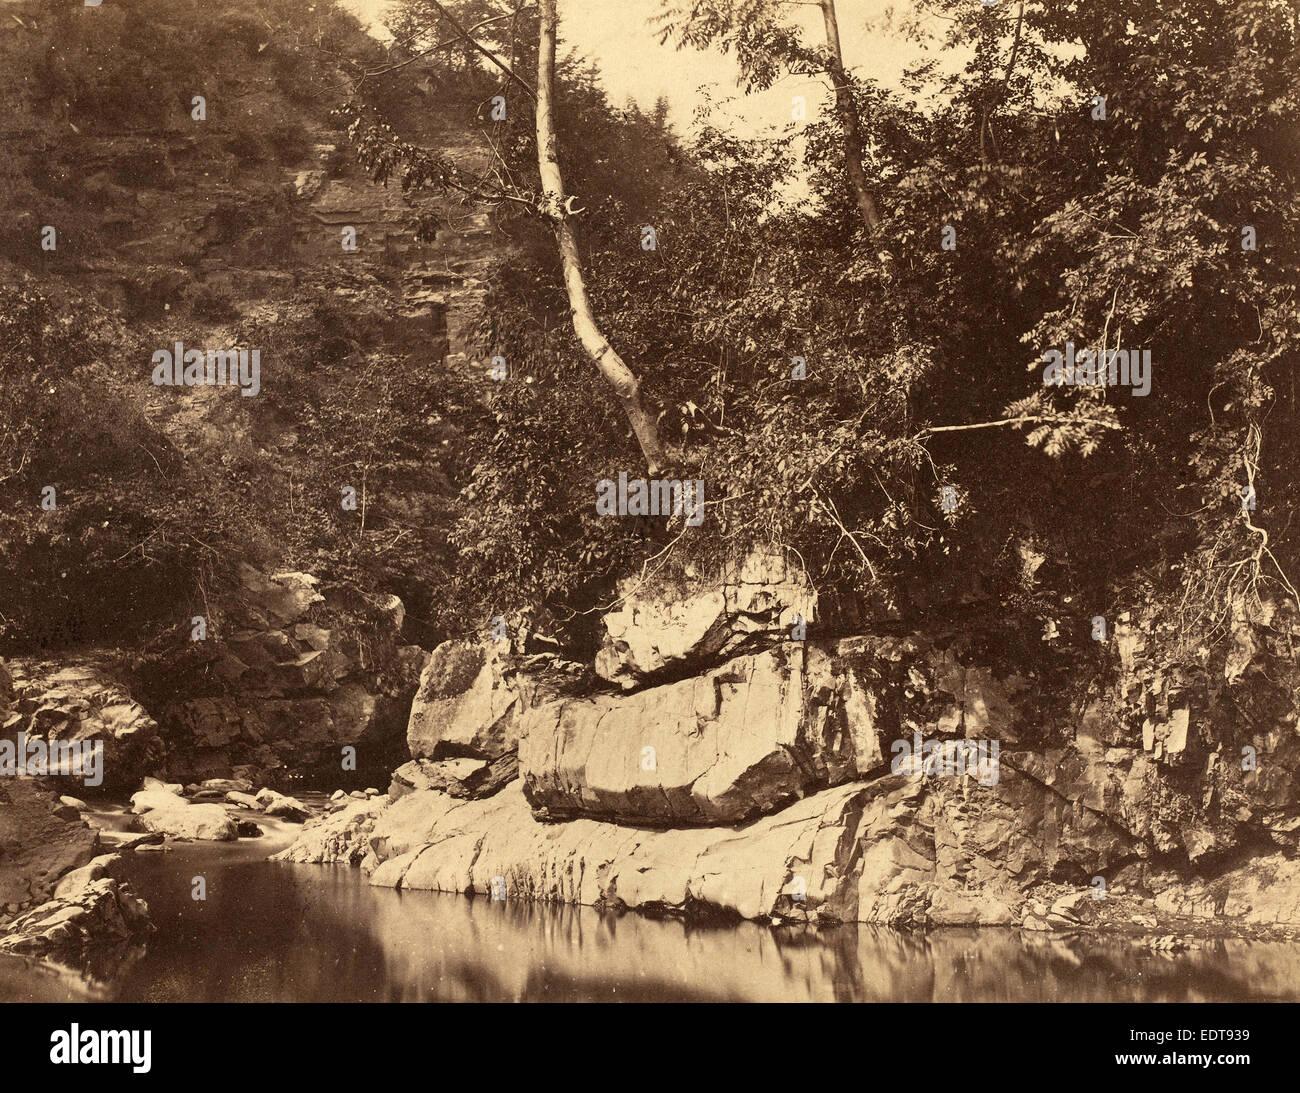 G.B. Gething (British, active c.1850s), River Scene, c. 1855, salted paper print - Stock Image